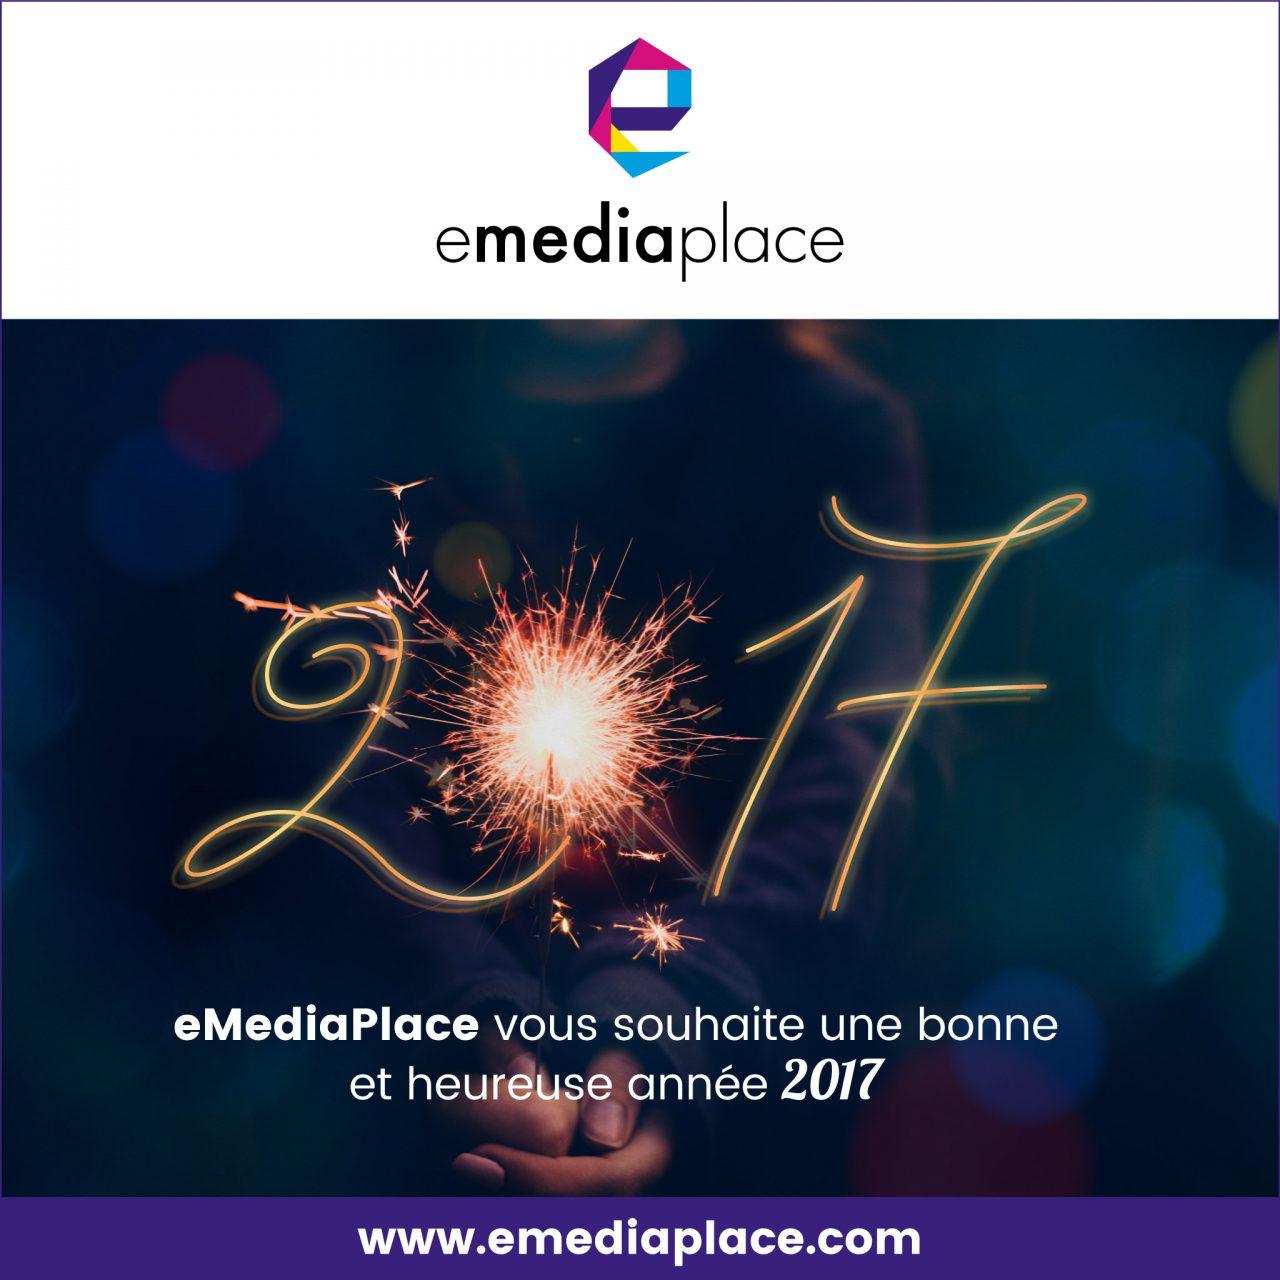 emediaplace-reveillon-2016-google